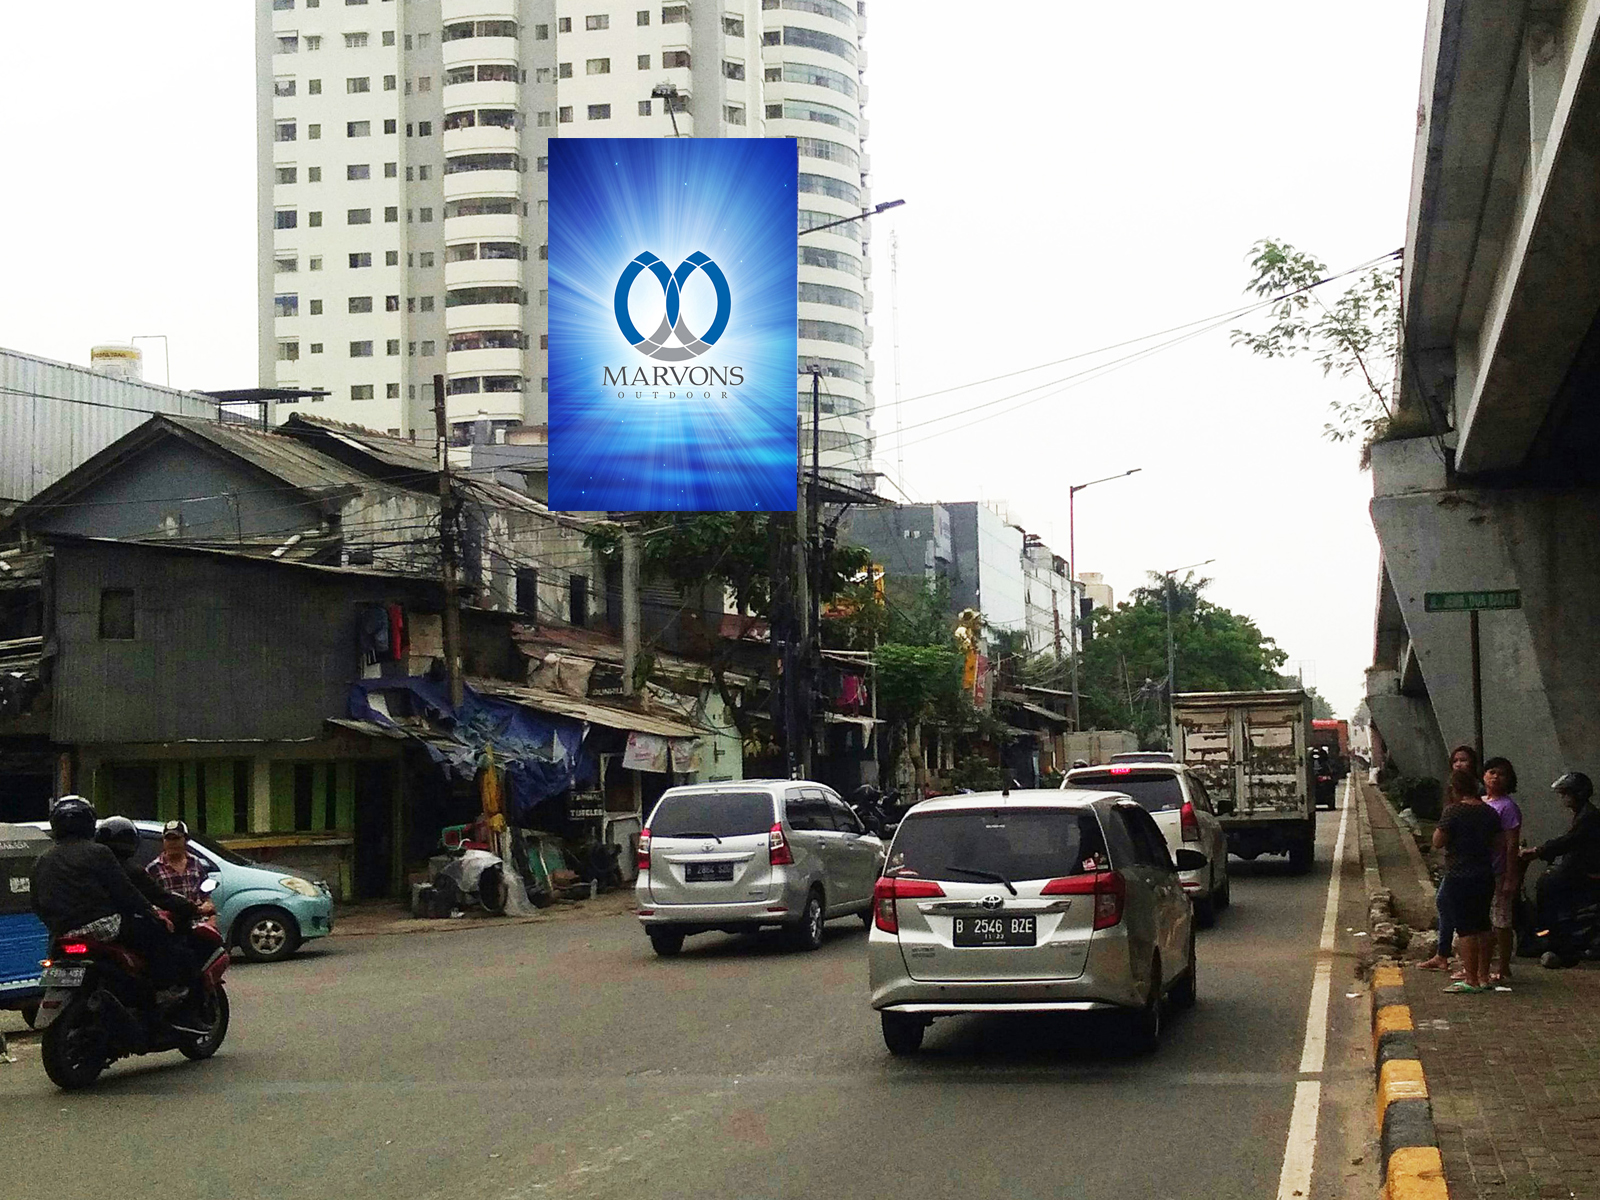 PT. Marvons Media Utama - Jembatan Dua (MV 092) - 4m x 6m x 1 mk Vertikal